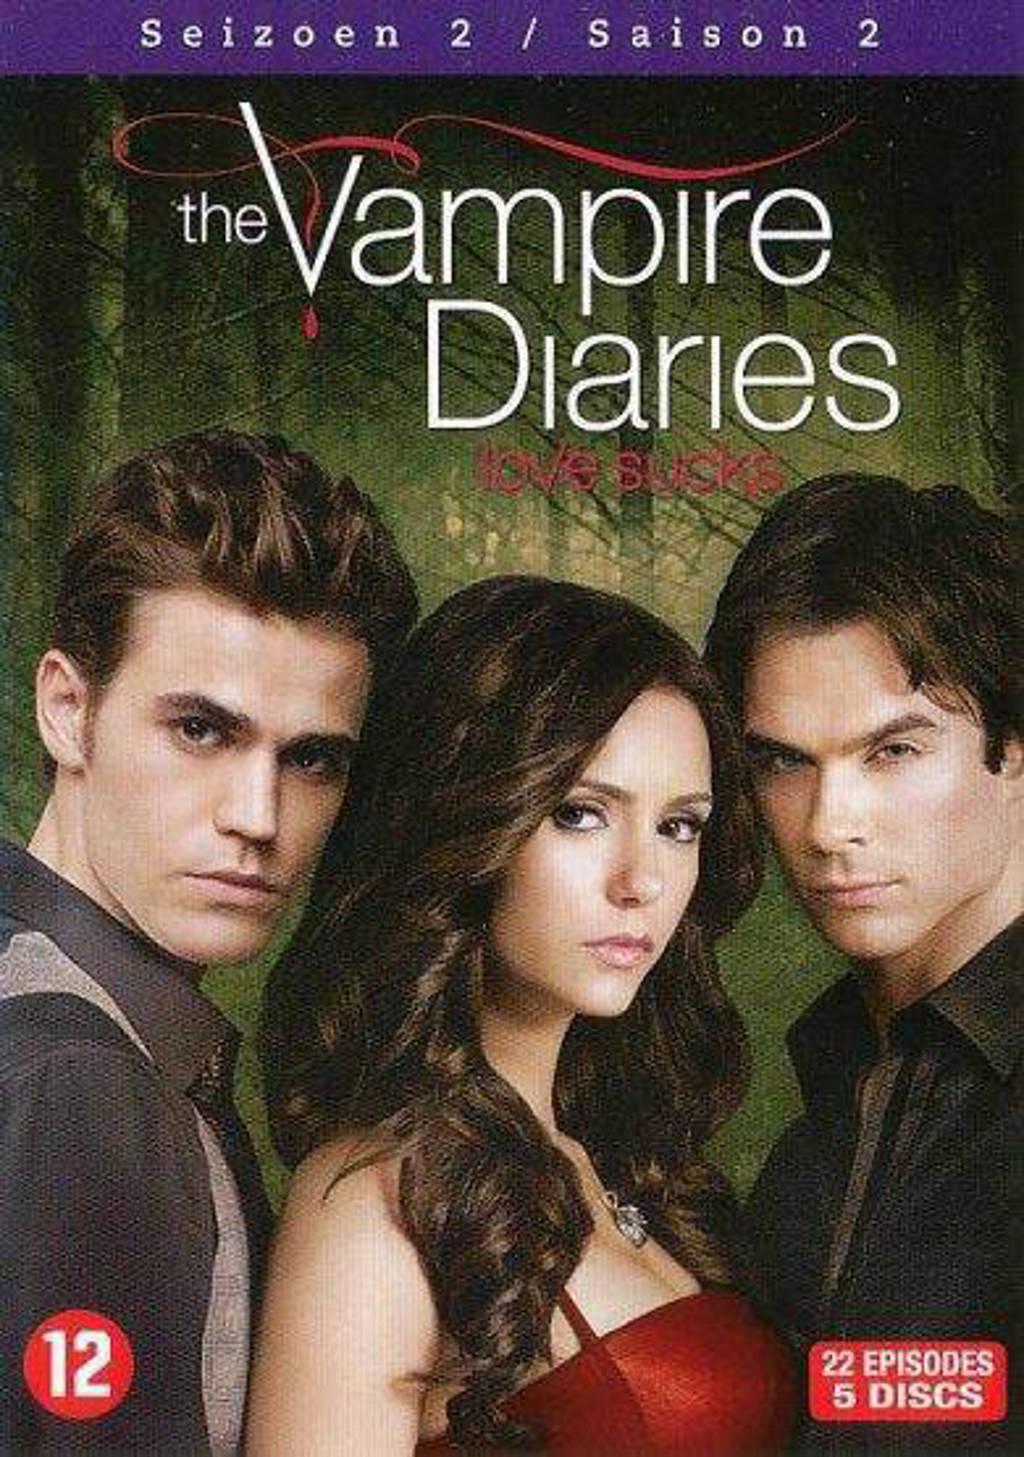 Vampire diaries - Seizoen 2 (DVD)